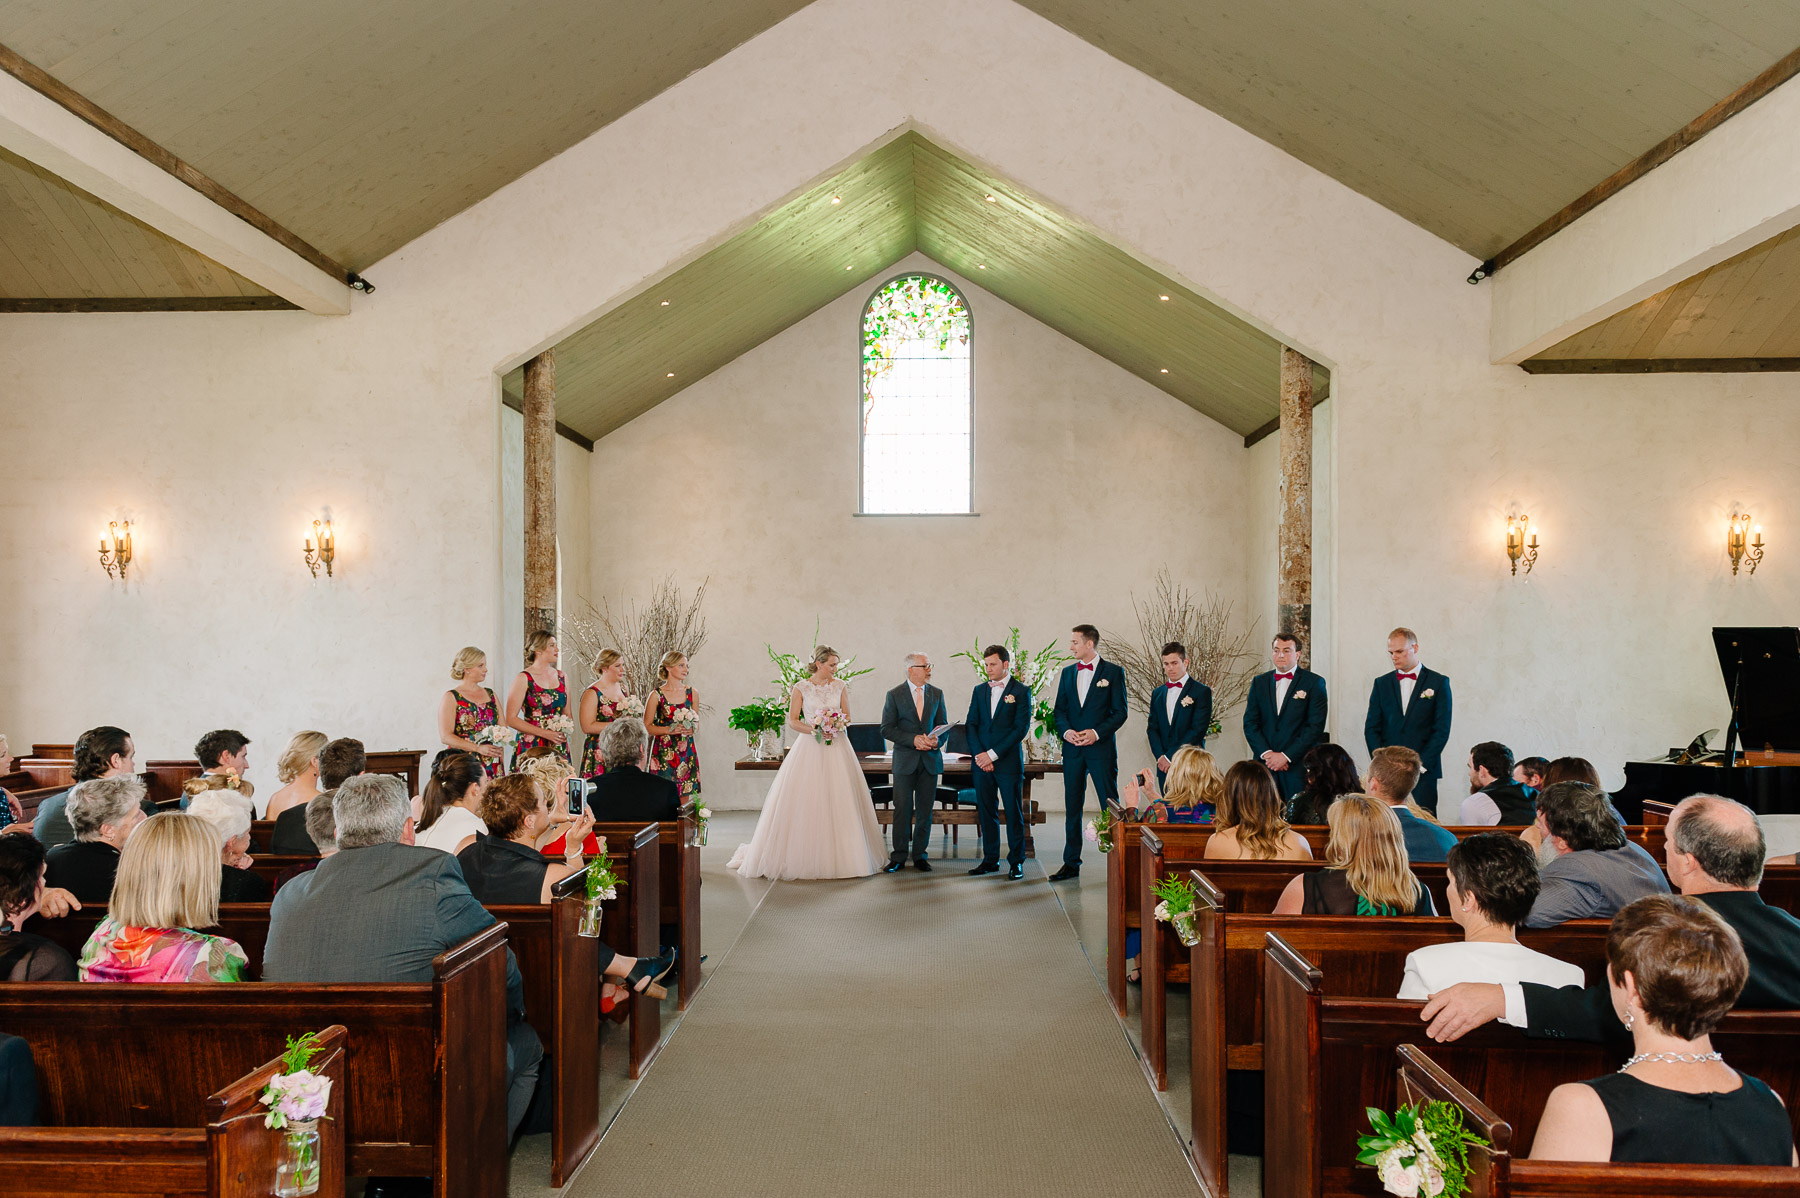 Marnie_and_Charlie_Yarra_Valley_Wedding_Blog-44.jpg